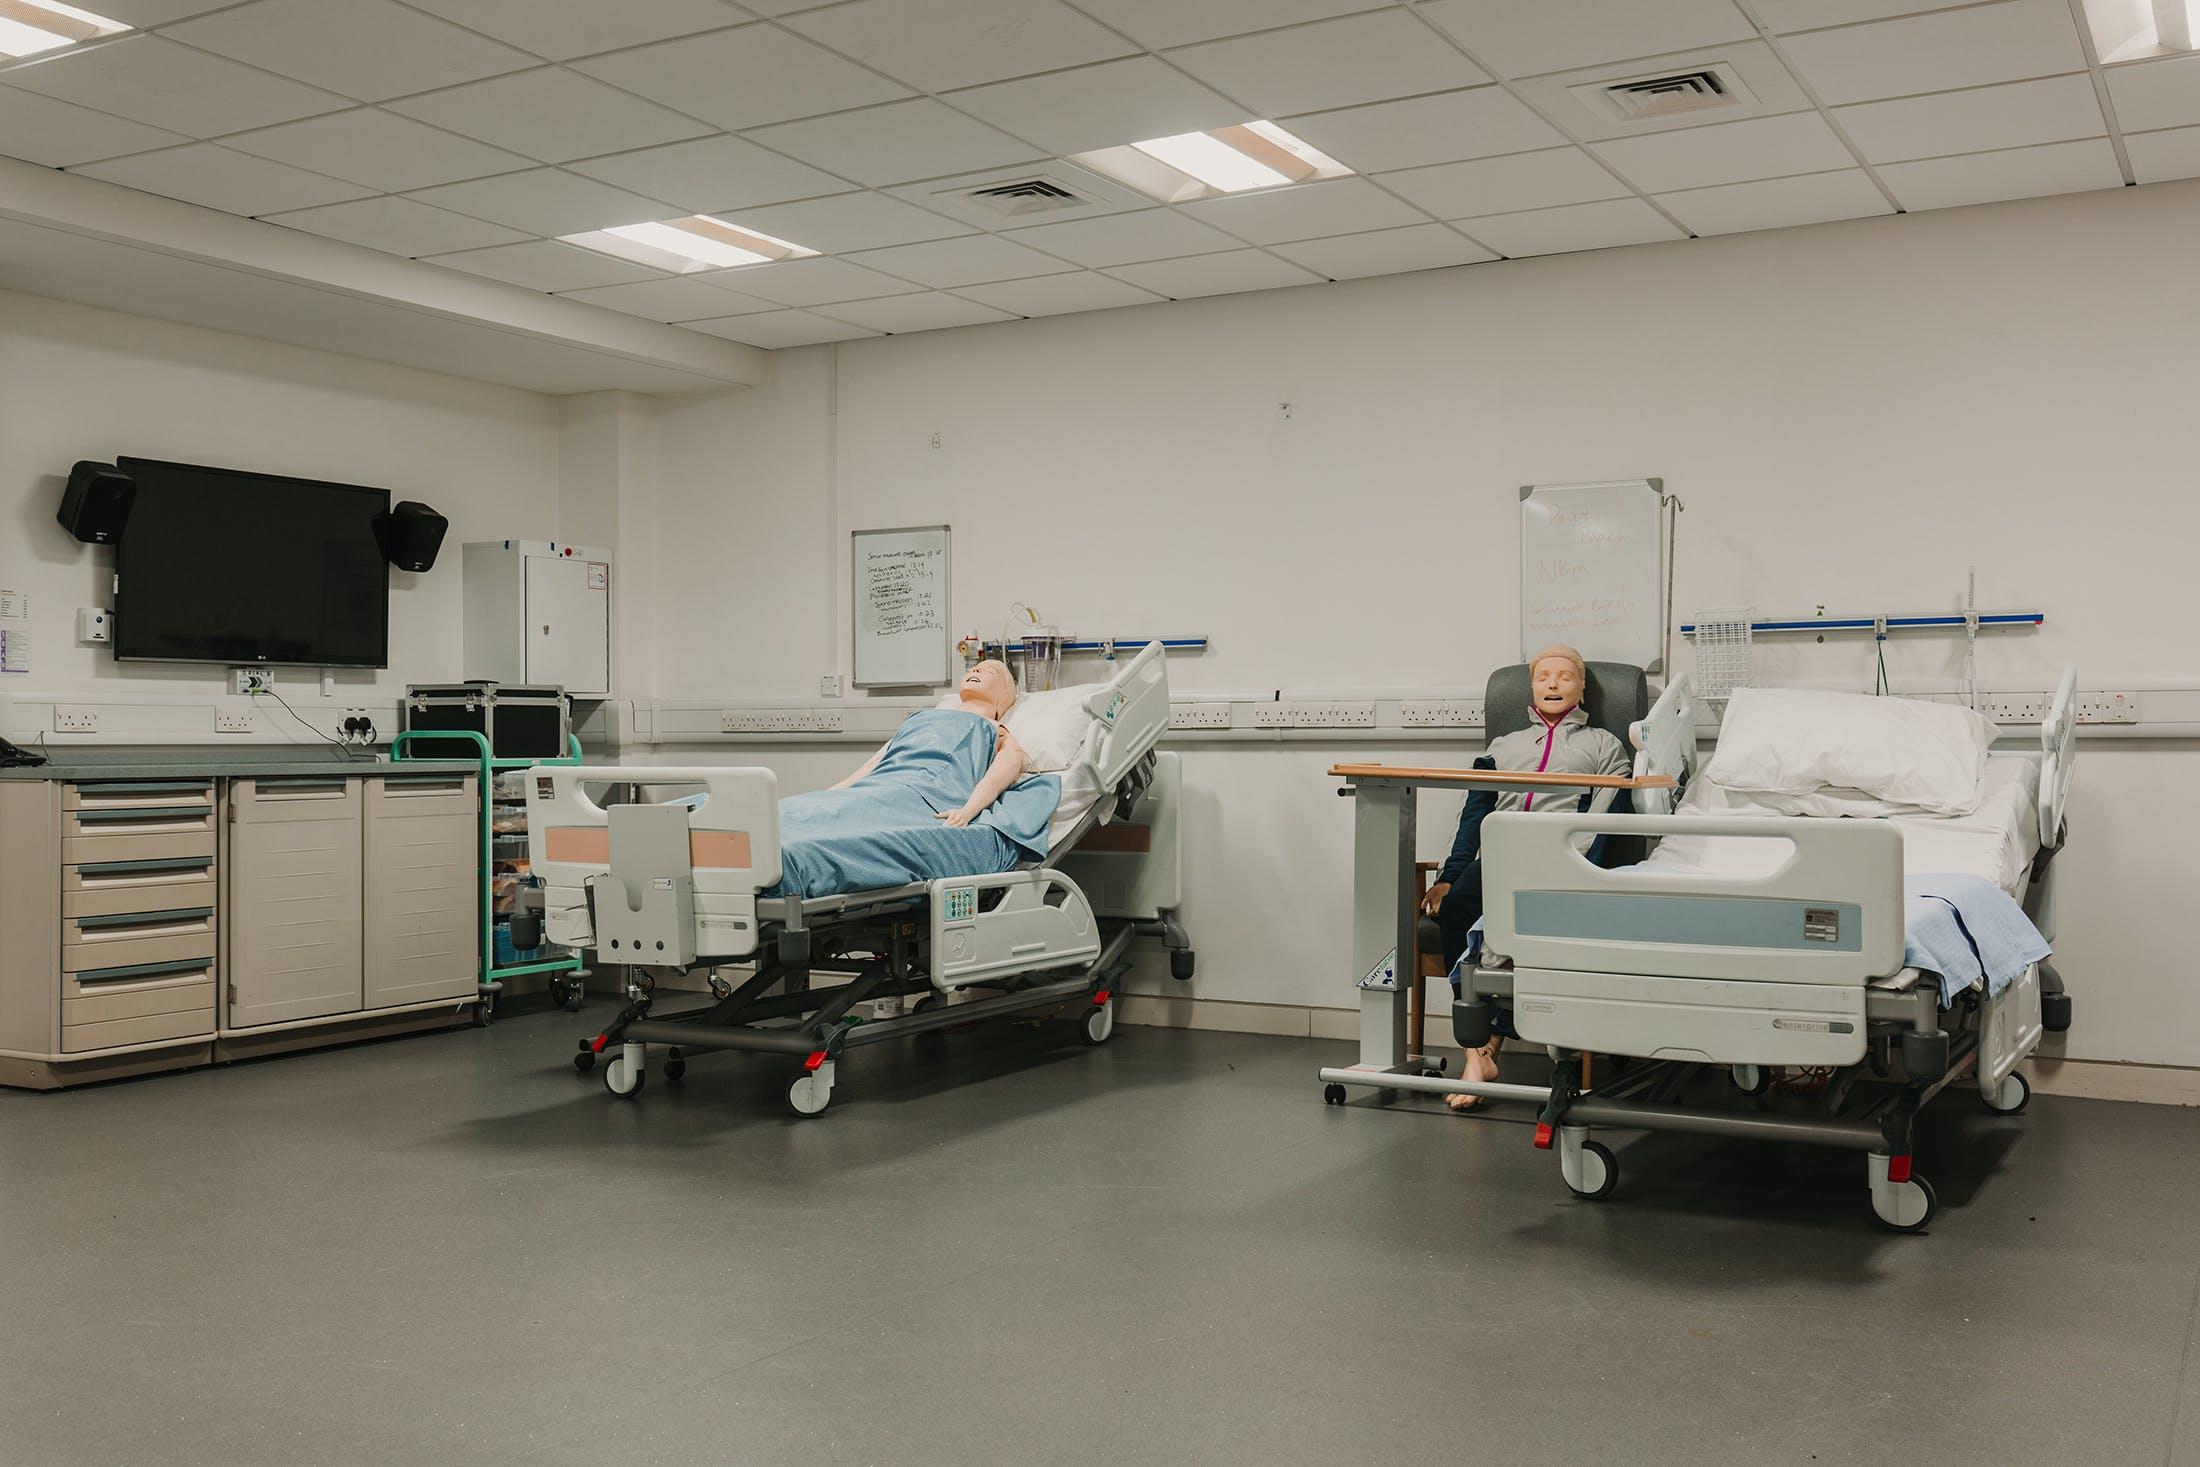 Nursing and Midwifery facilities - 1 adult ward